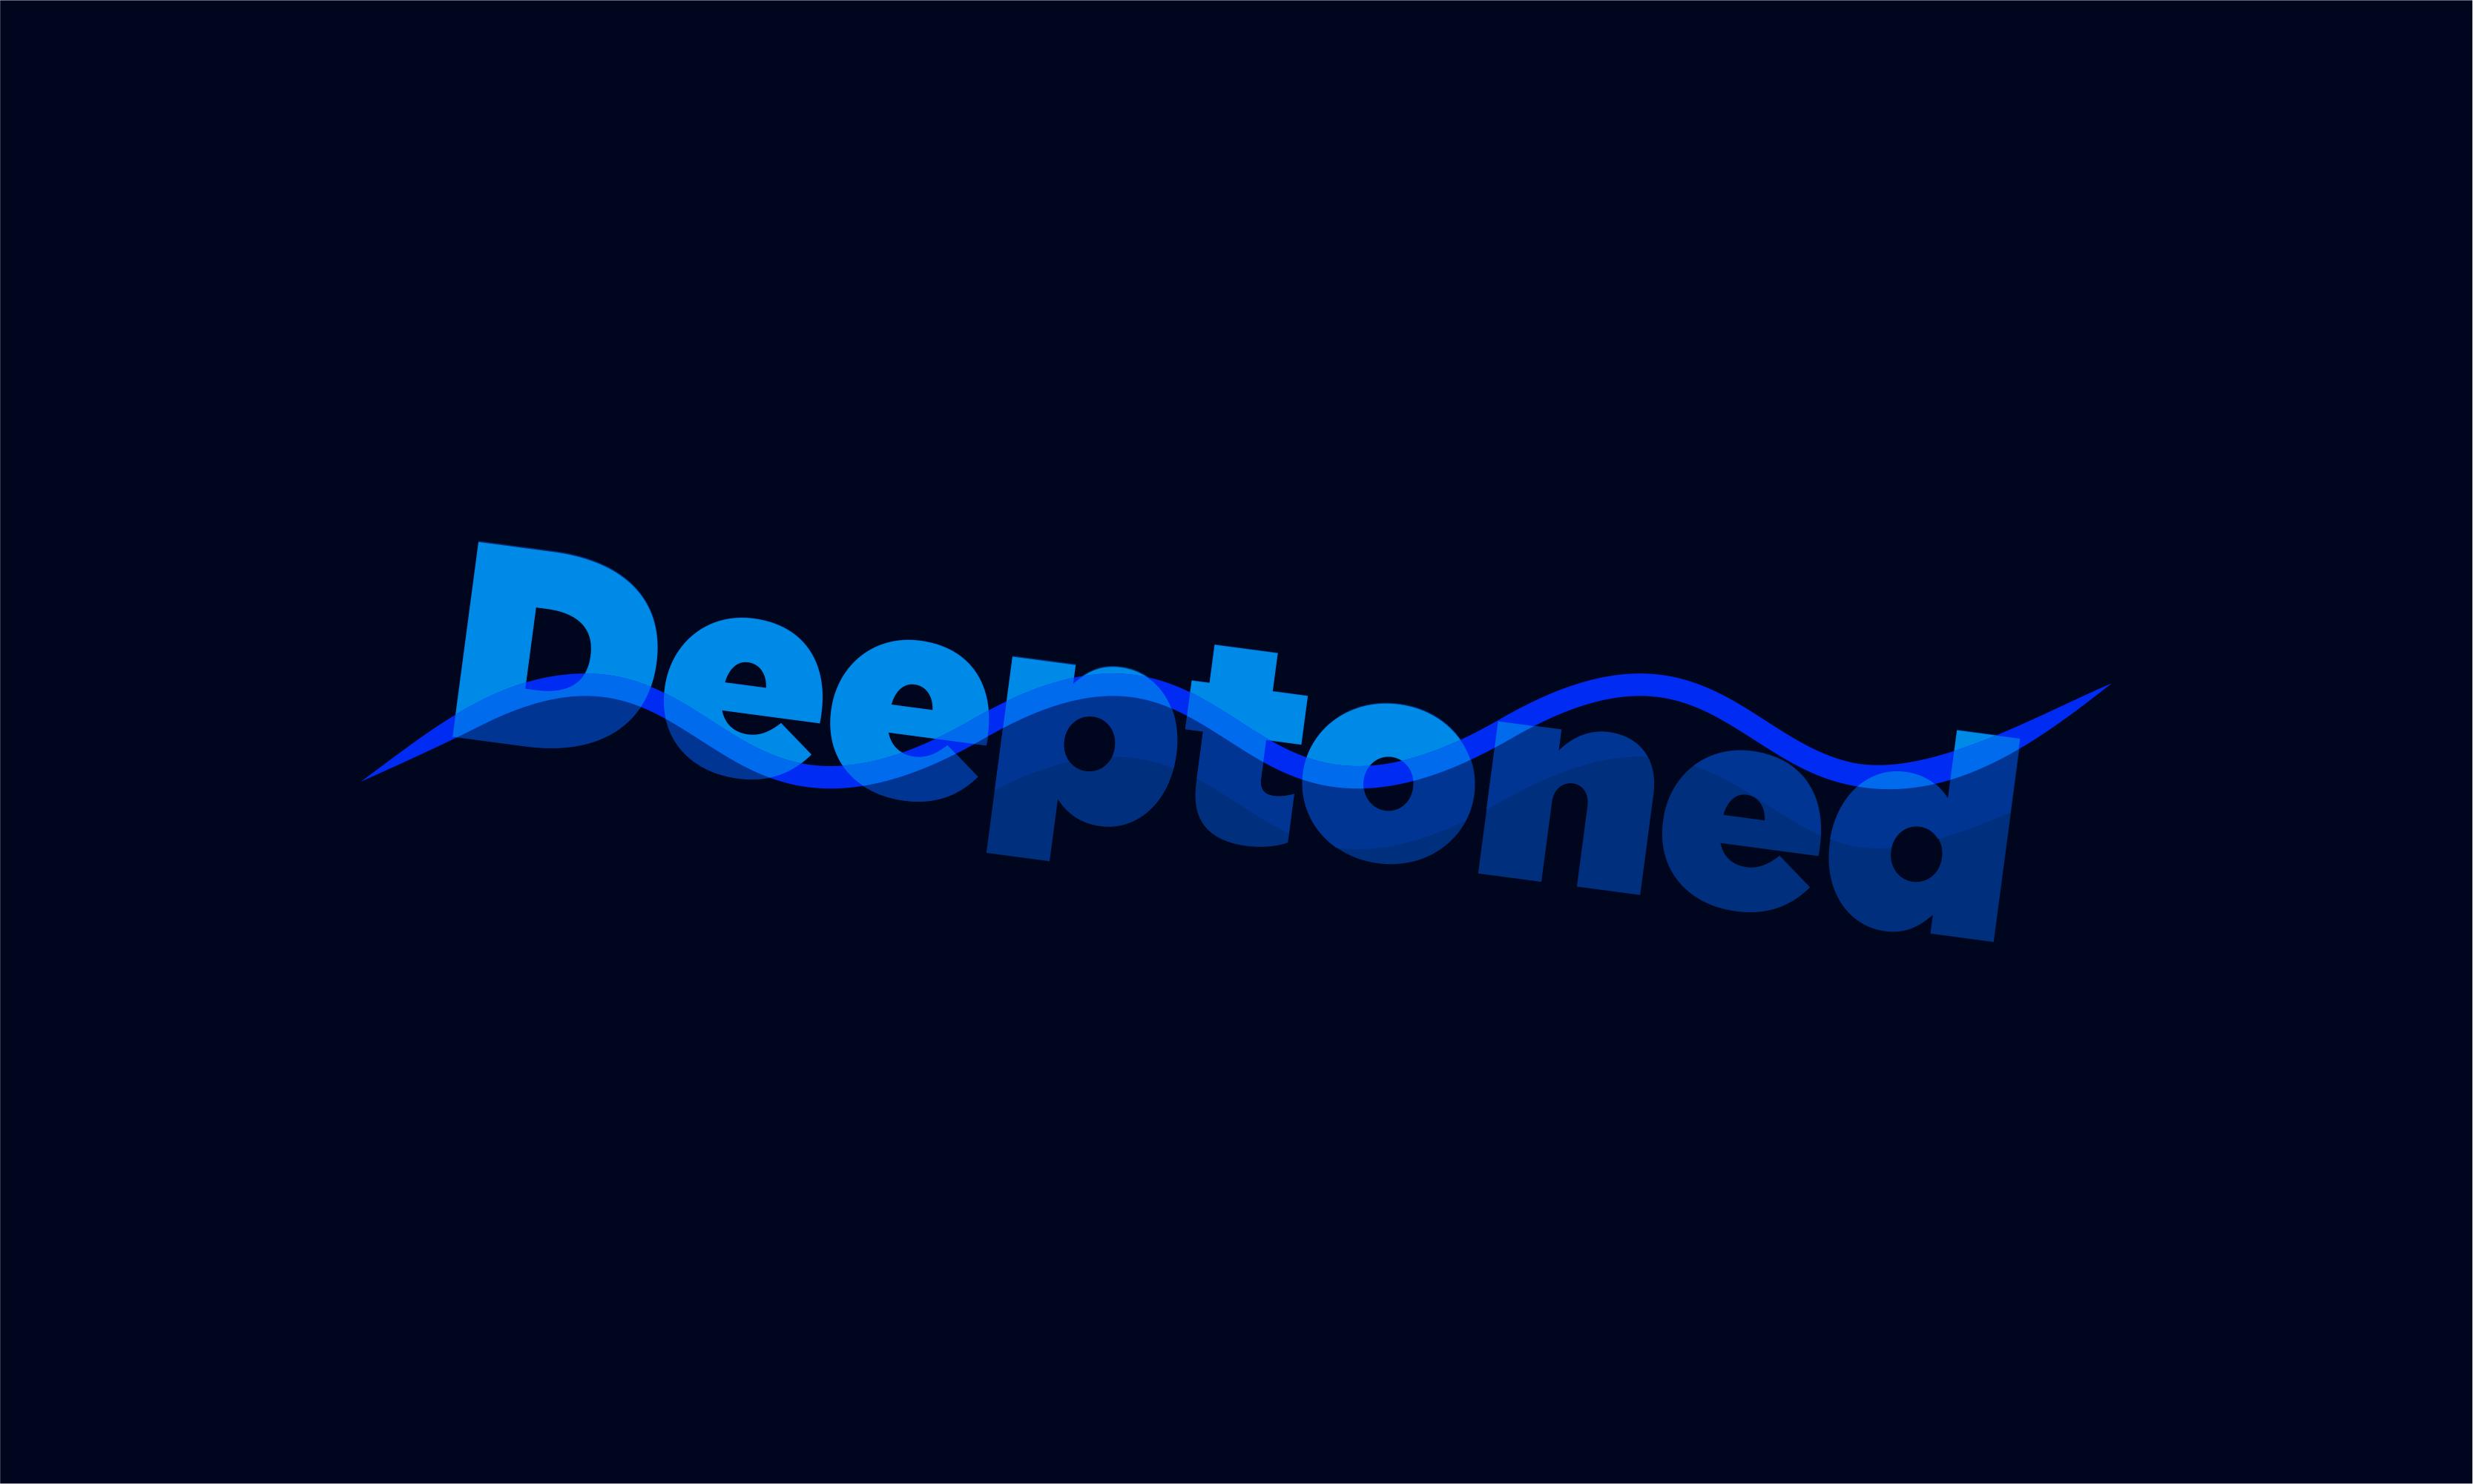 Deeptoned